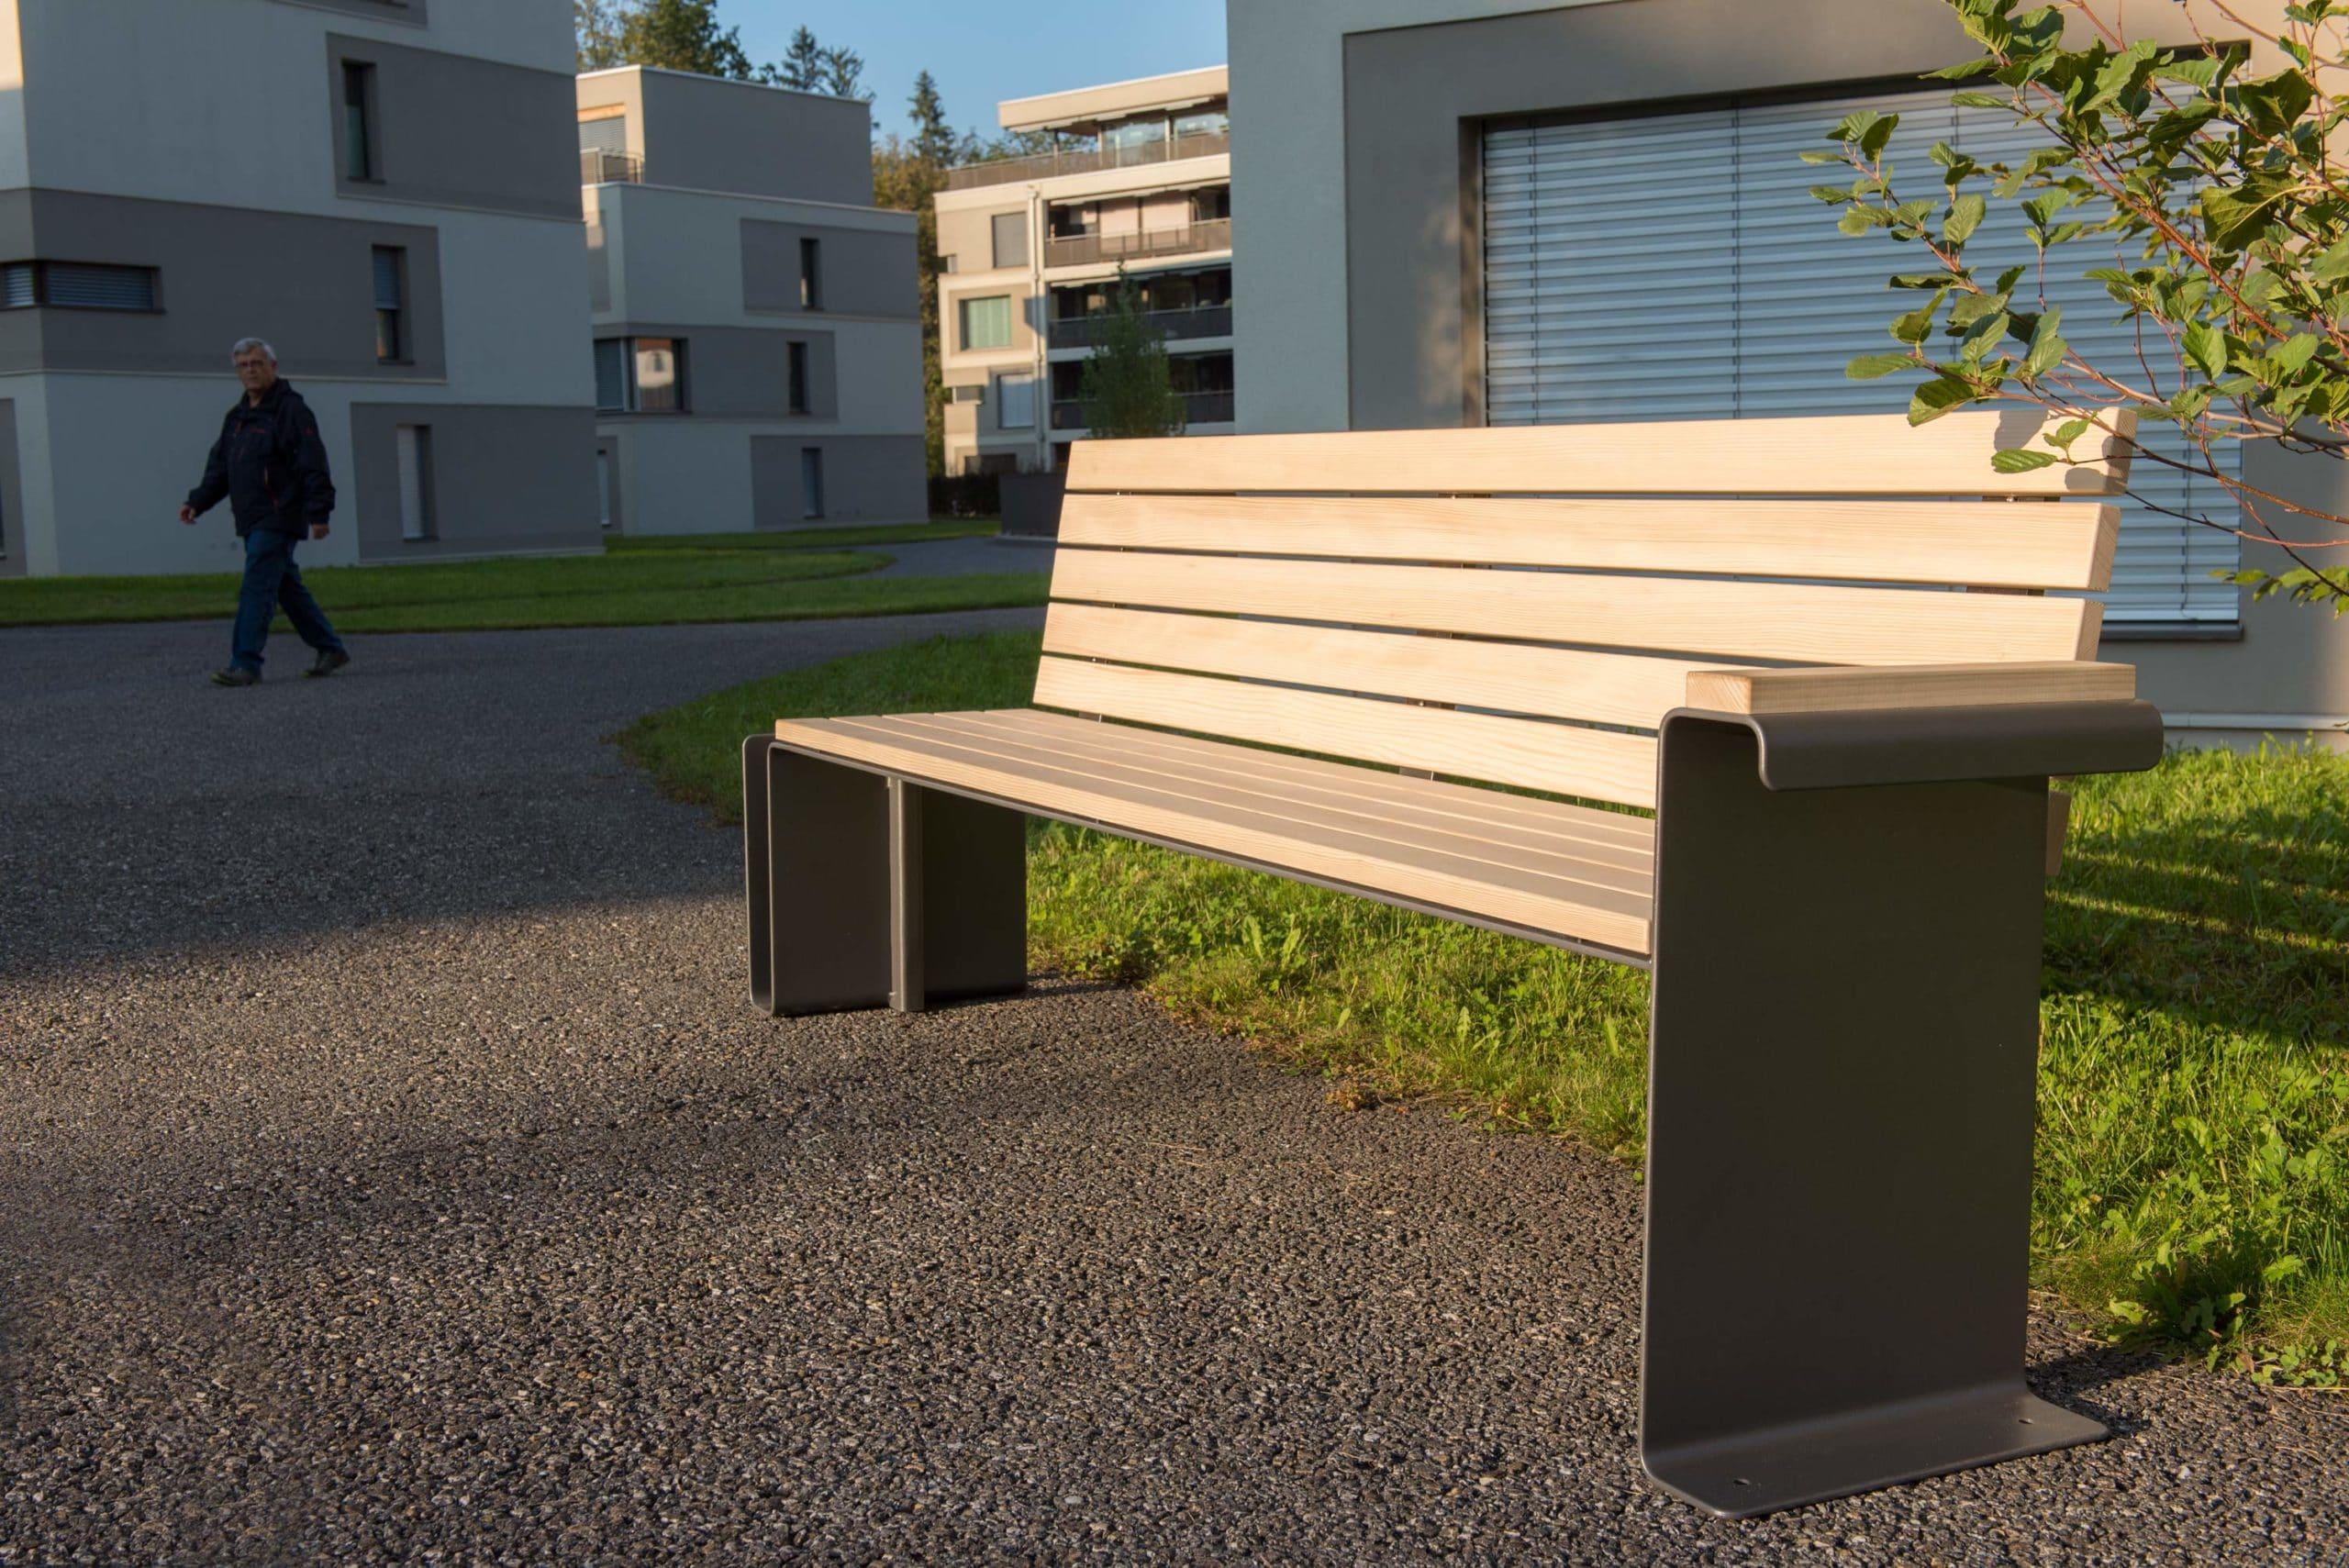 Parkbank Parker Due, Schweizer Bank, Sitzbank, Unesco Biosphäre Entlebuch, public furniture, Raum Mobiliar, Stadt Mobiliar